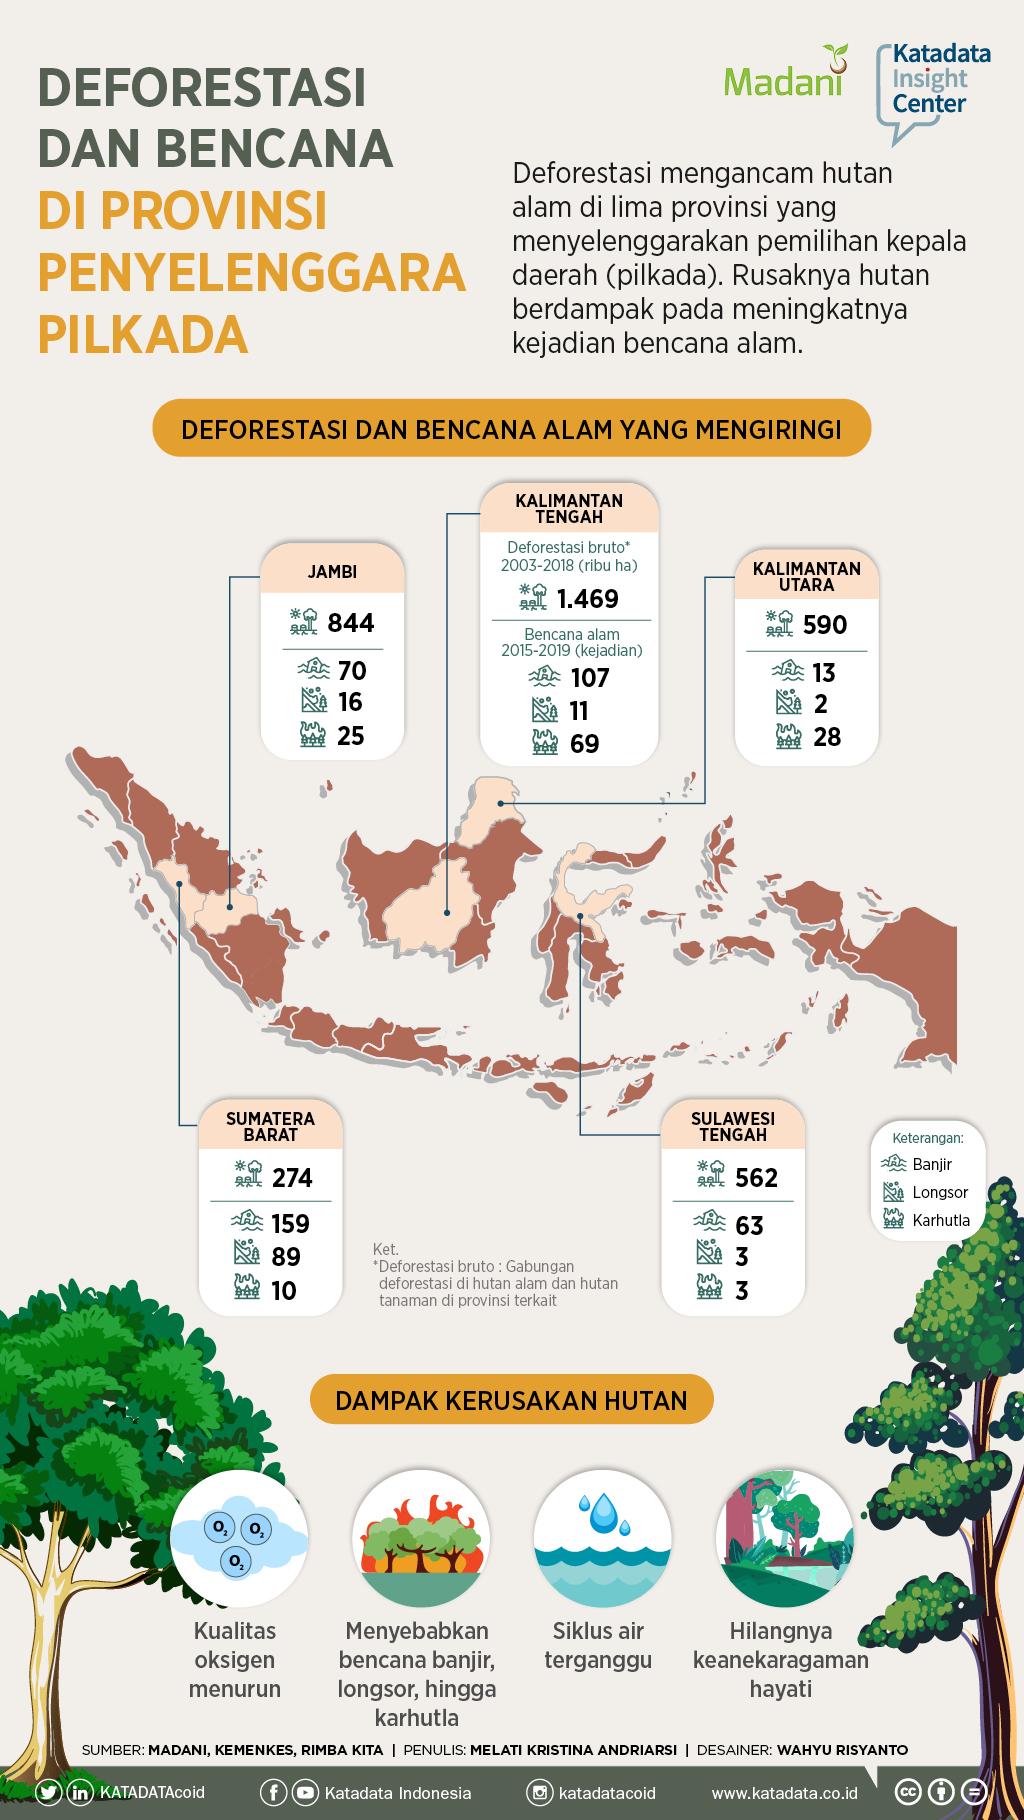 Deforestasi dan Bencana